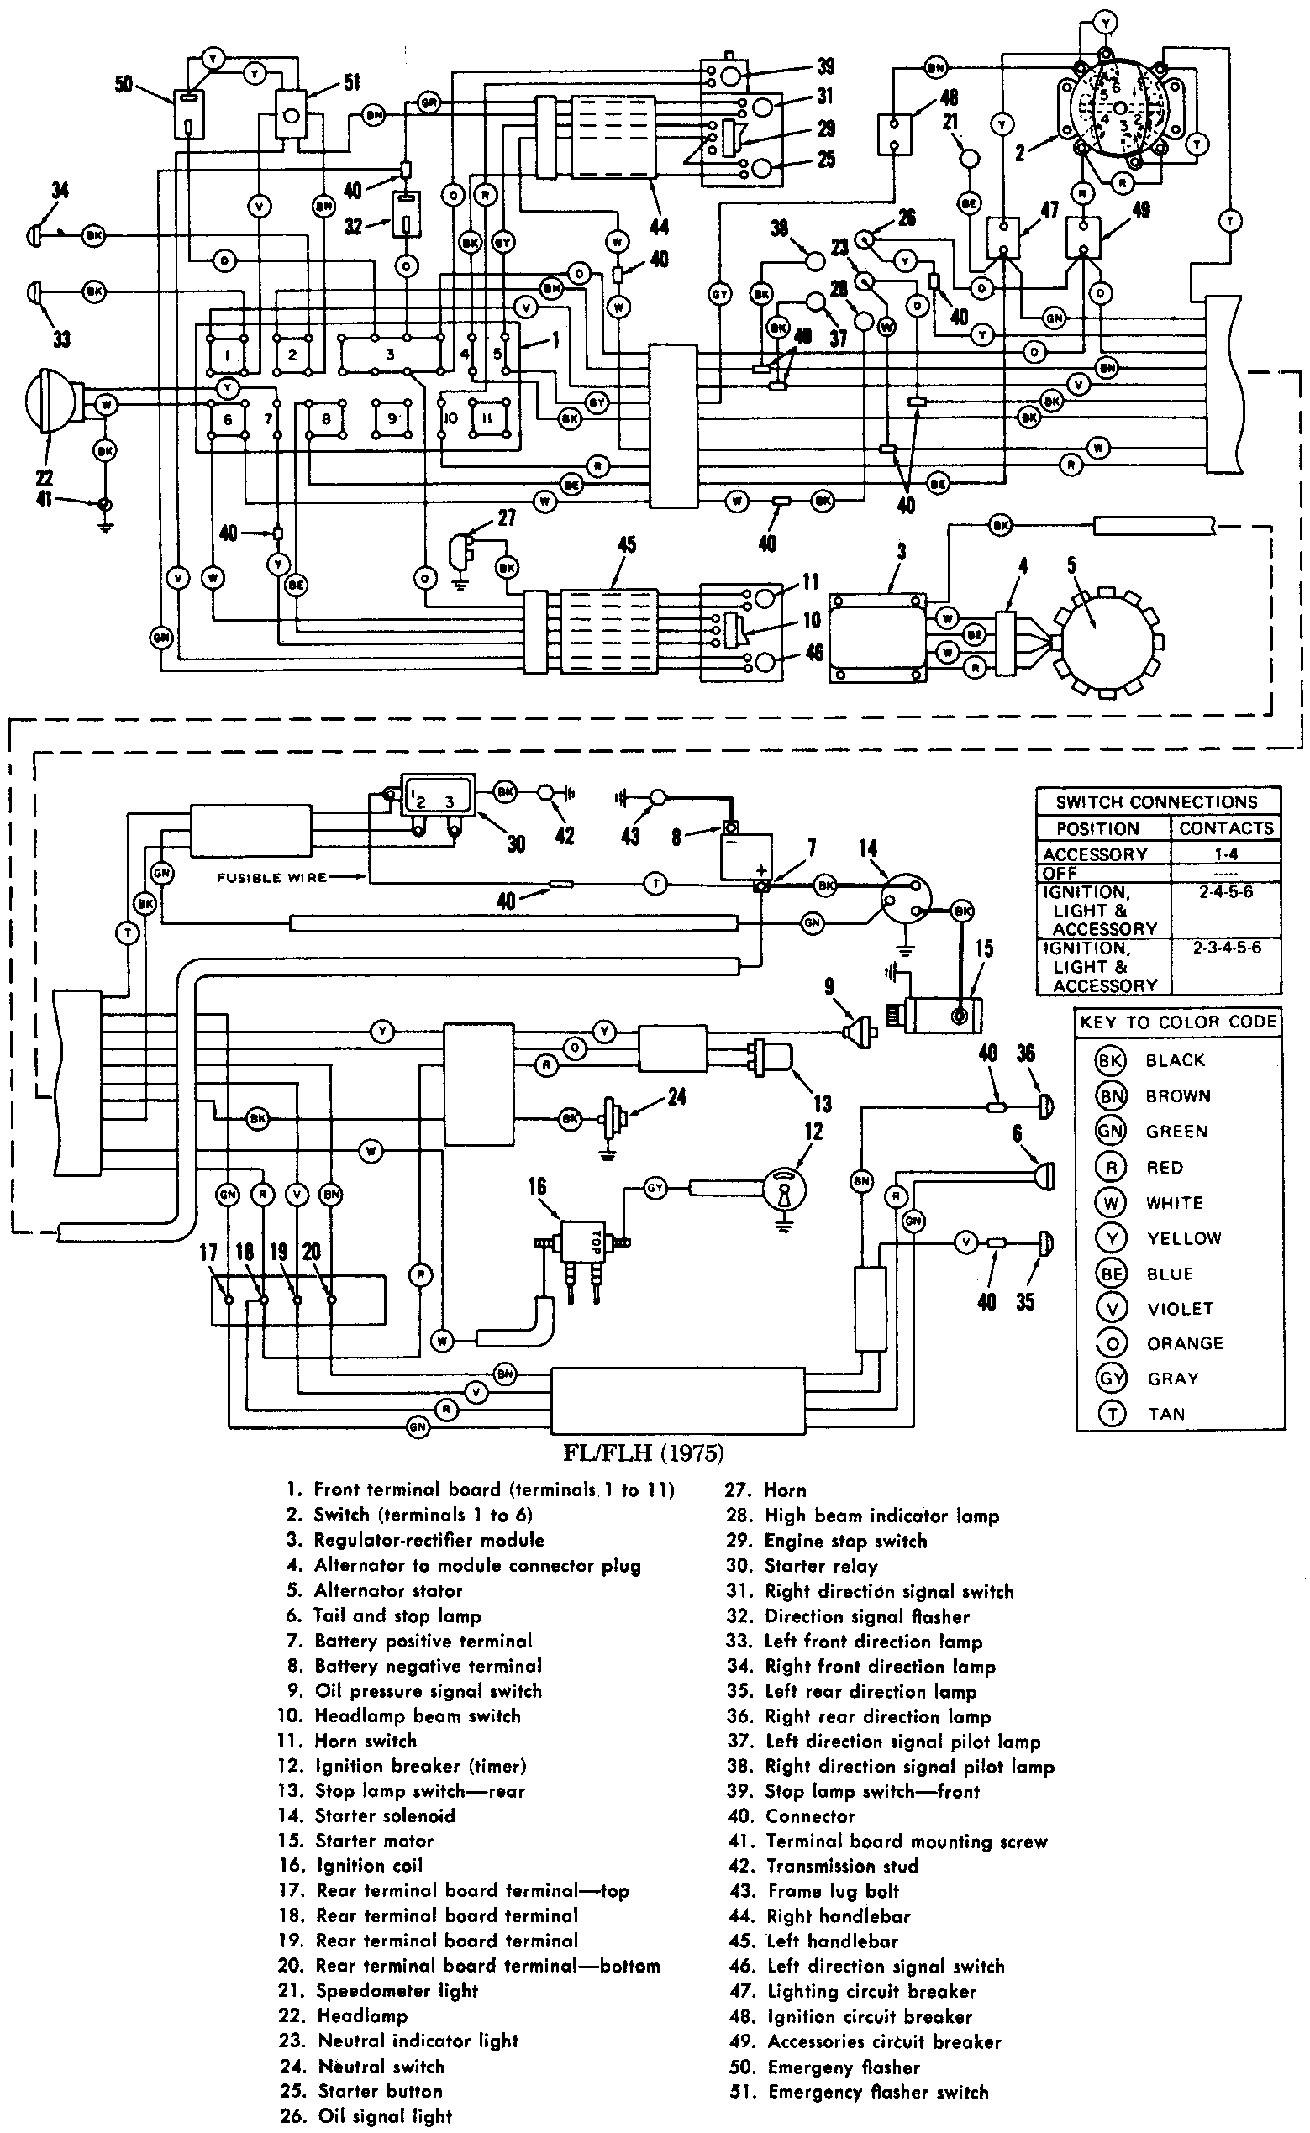 Diagram 1980 Fxb Shovelhead Wiring Diagram Full Version Hd Quality Wiring Diagram Diagramsheise Festadelluvavagliagli It